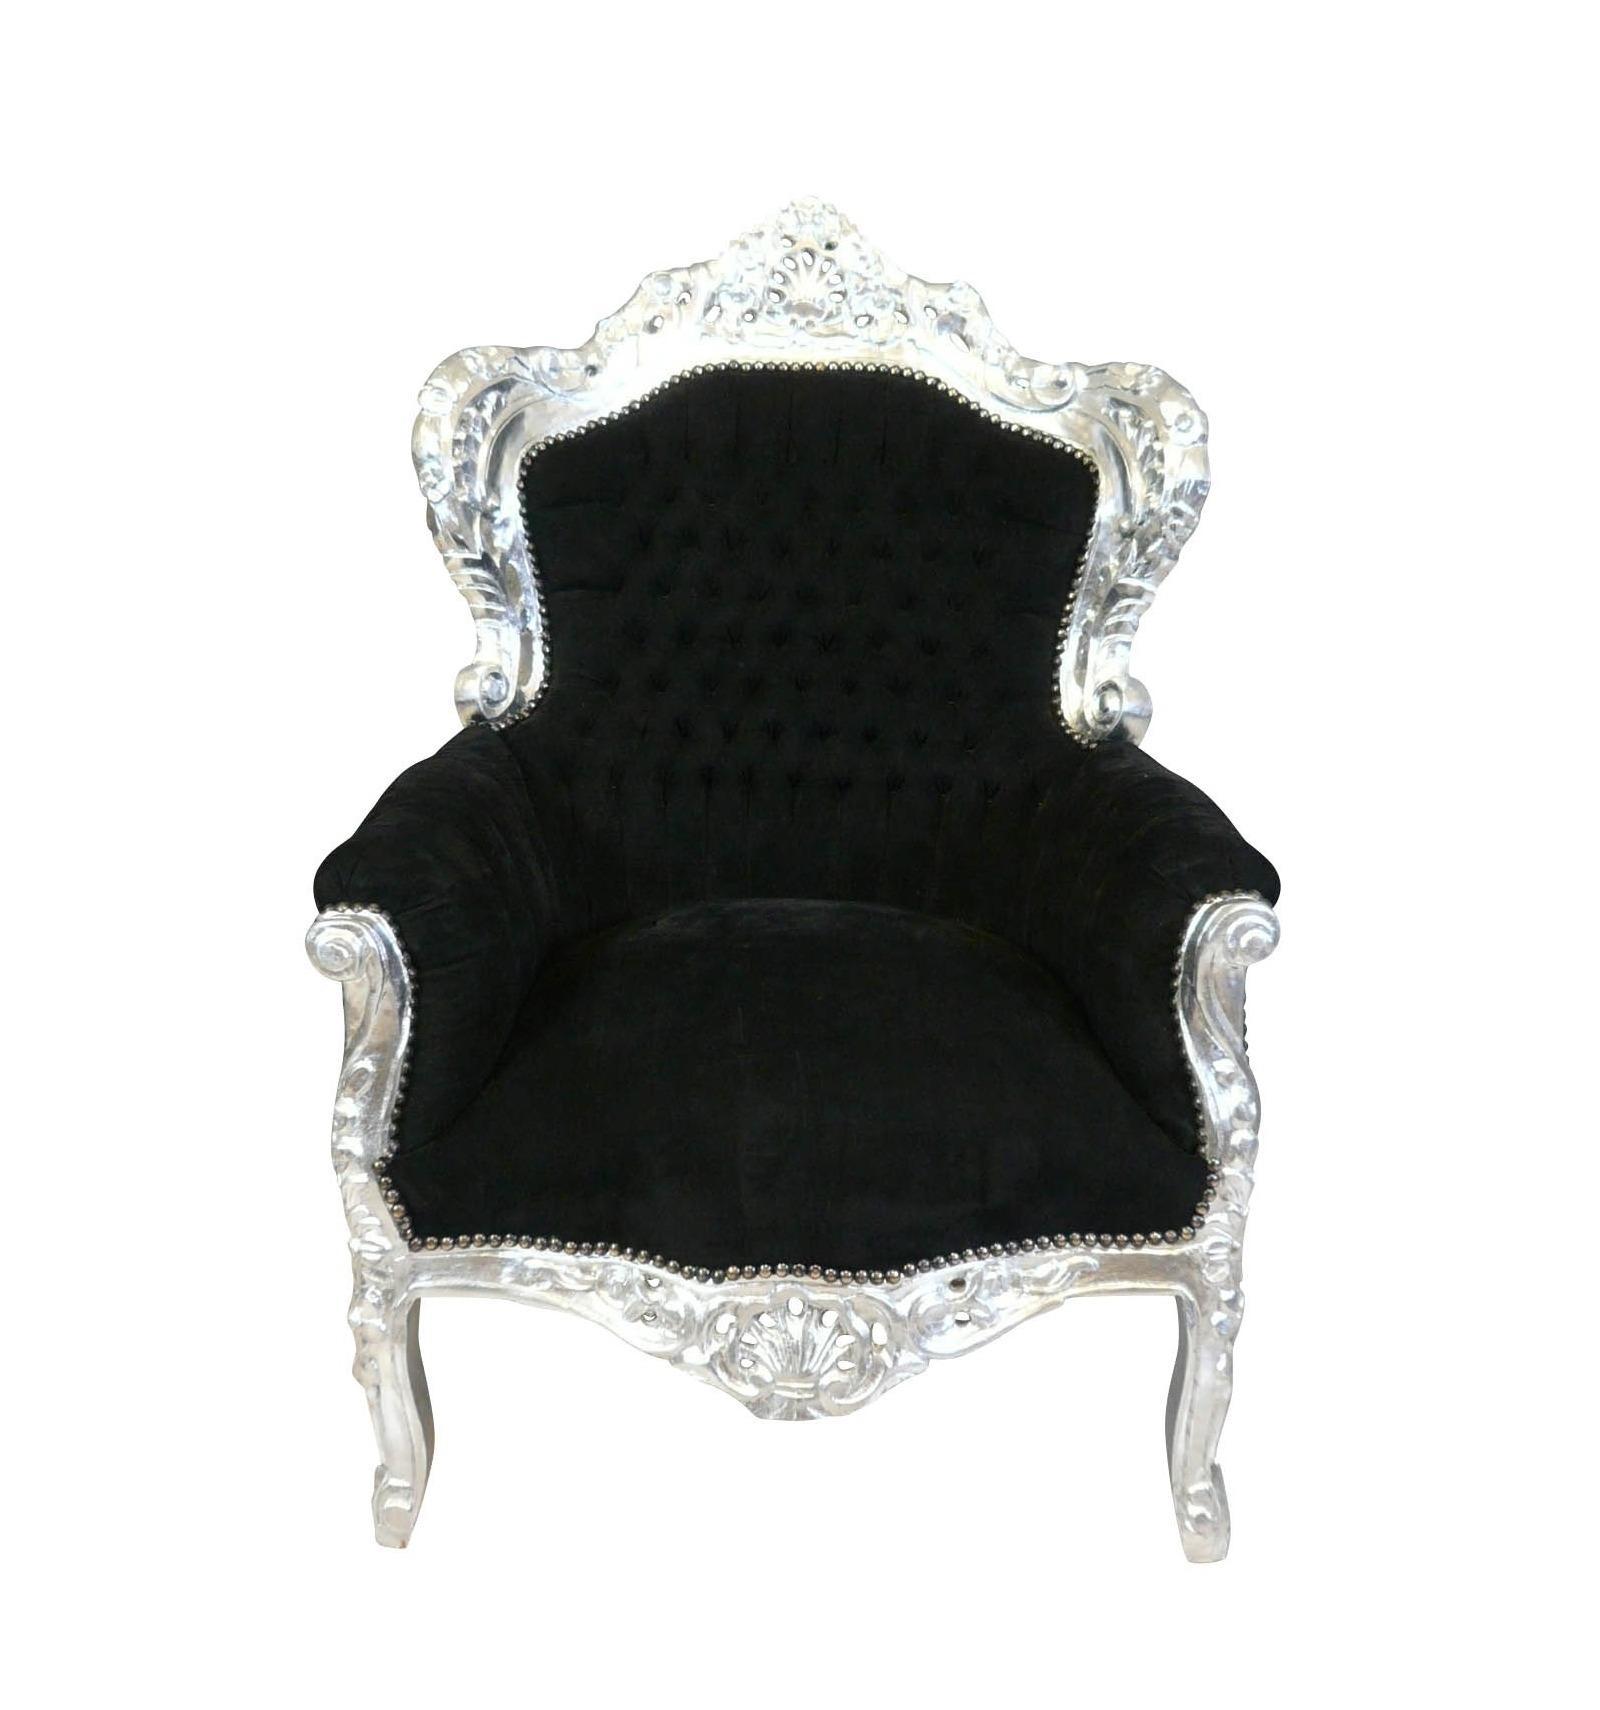 Schwarzer Royal Baroque Sessel In Silber Geschnitztem Holz